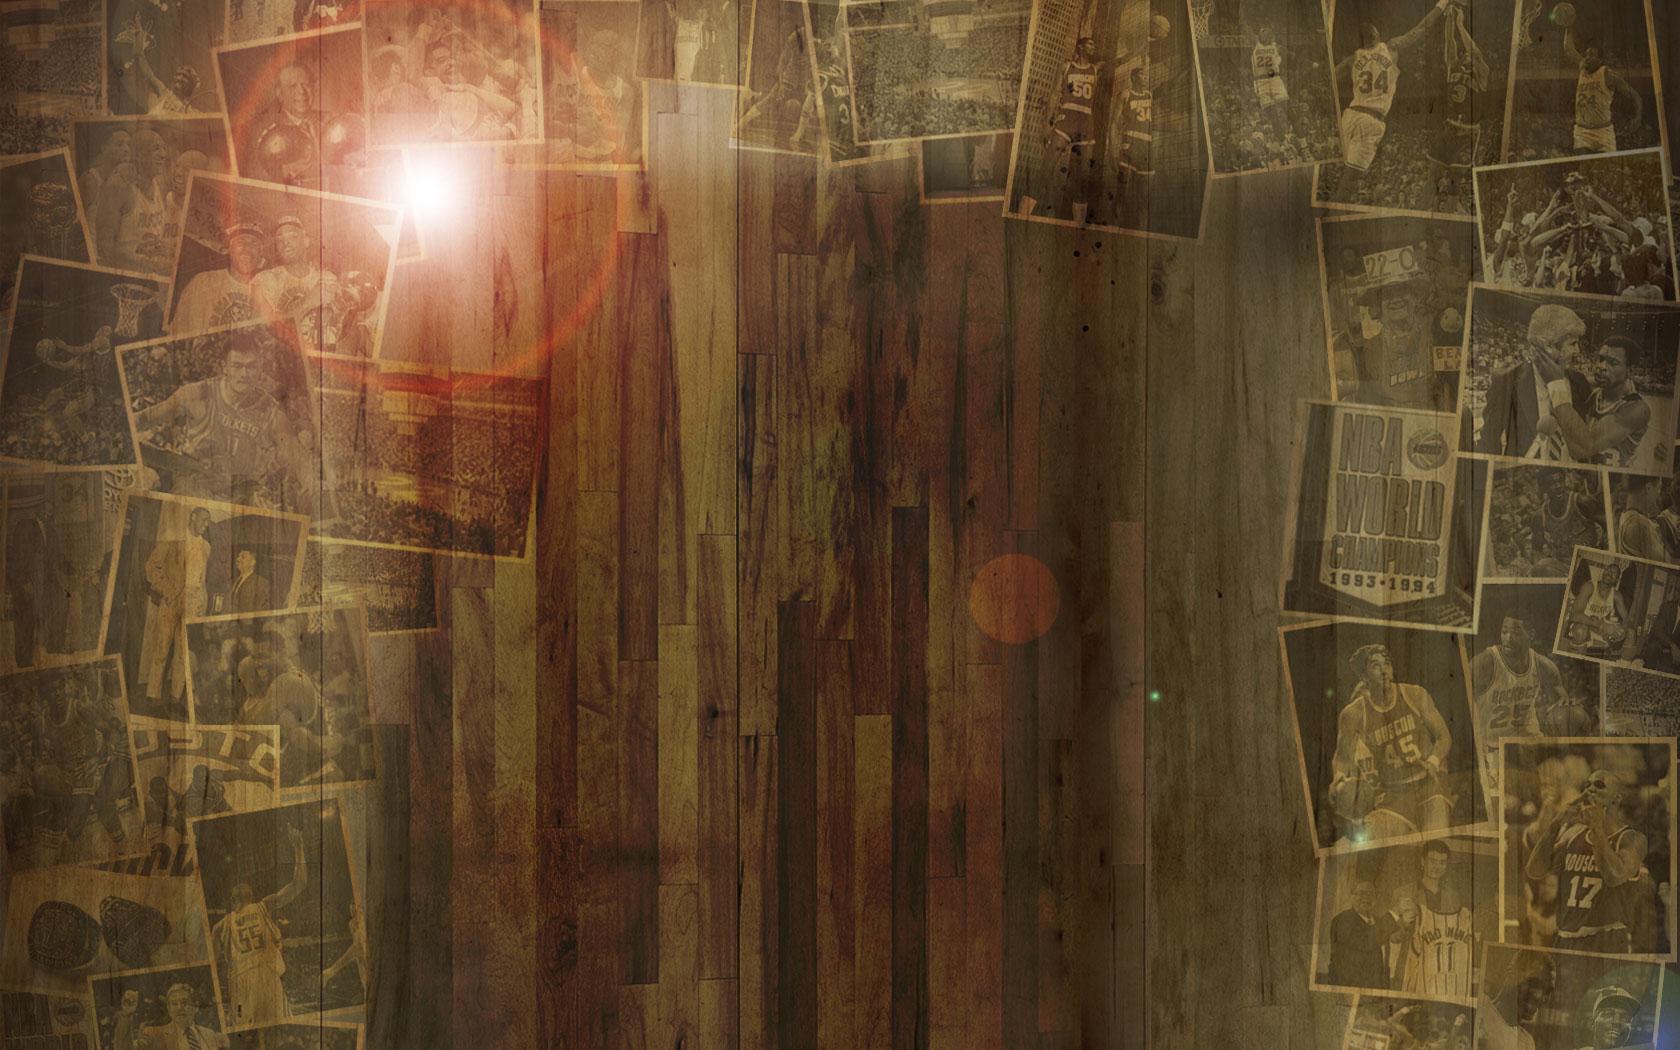 Tracy Mcgrady Iphone Wallpaper Rockets 1680 215 1050 Background Wallpaper Basketball